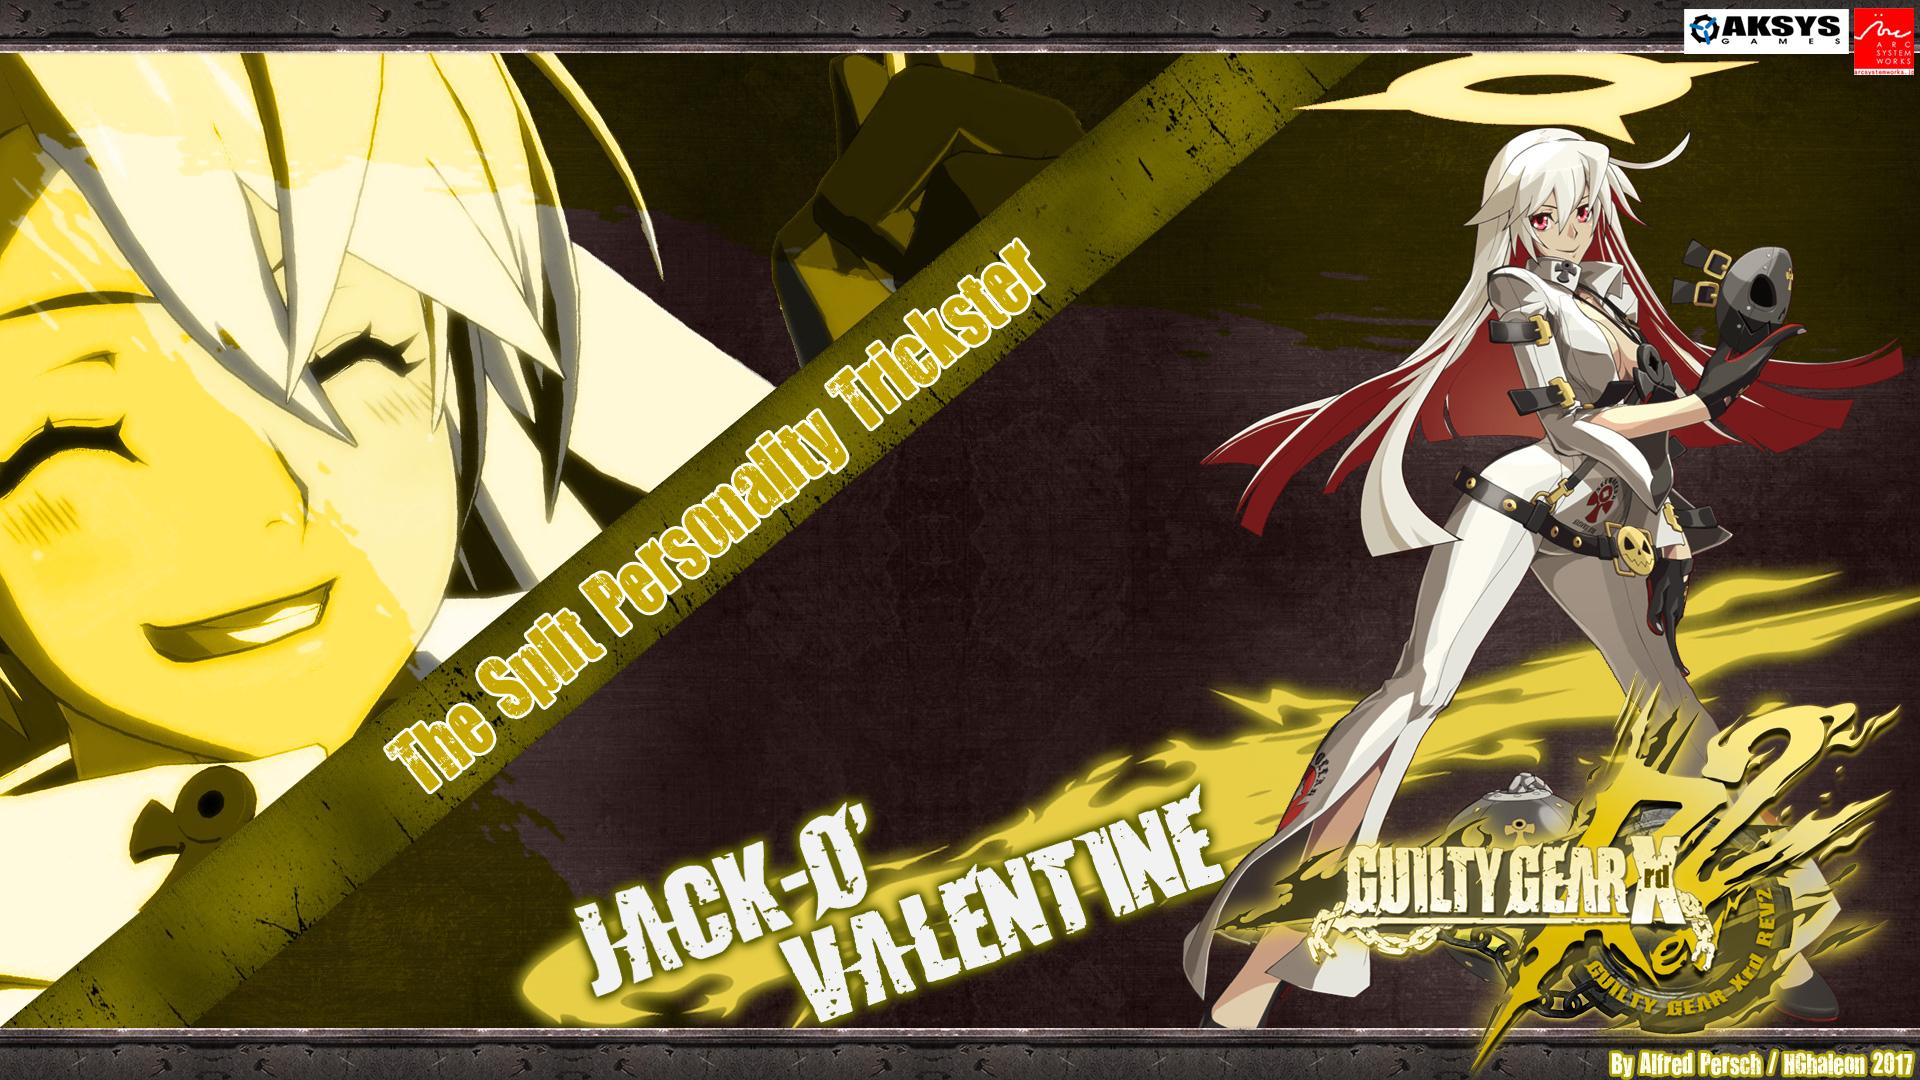 guilty gear xrd revelator jack o valentine \u2013 ps4wallpapers comdownload wallpaper · guilty gear xrd revelatorjack o valentine